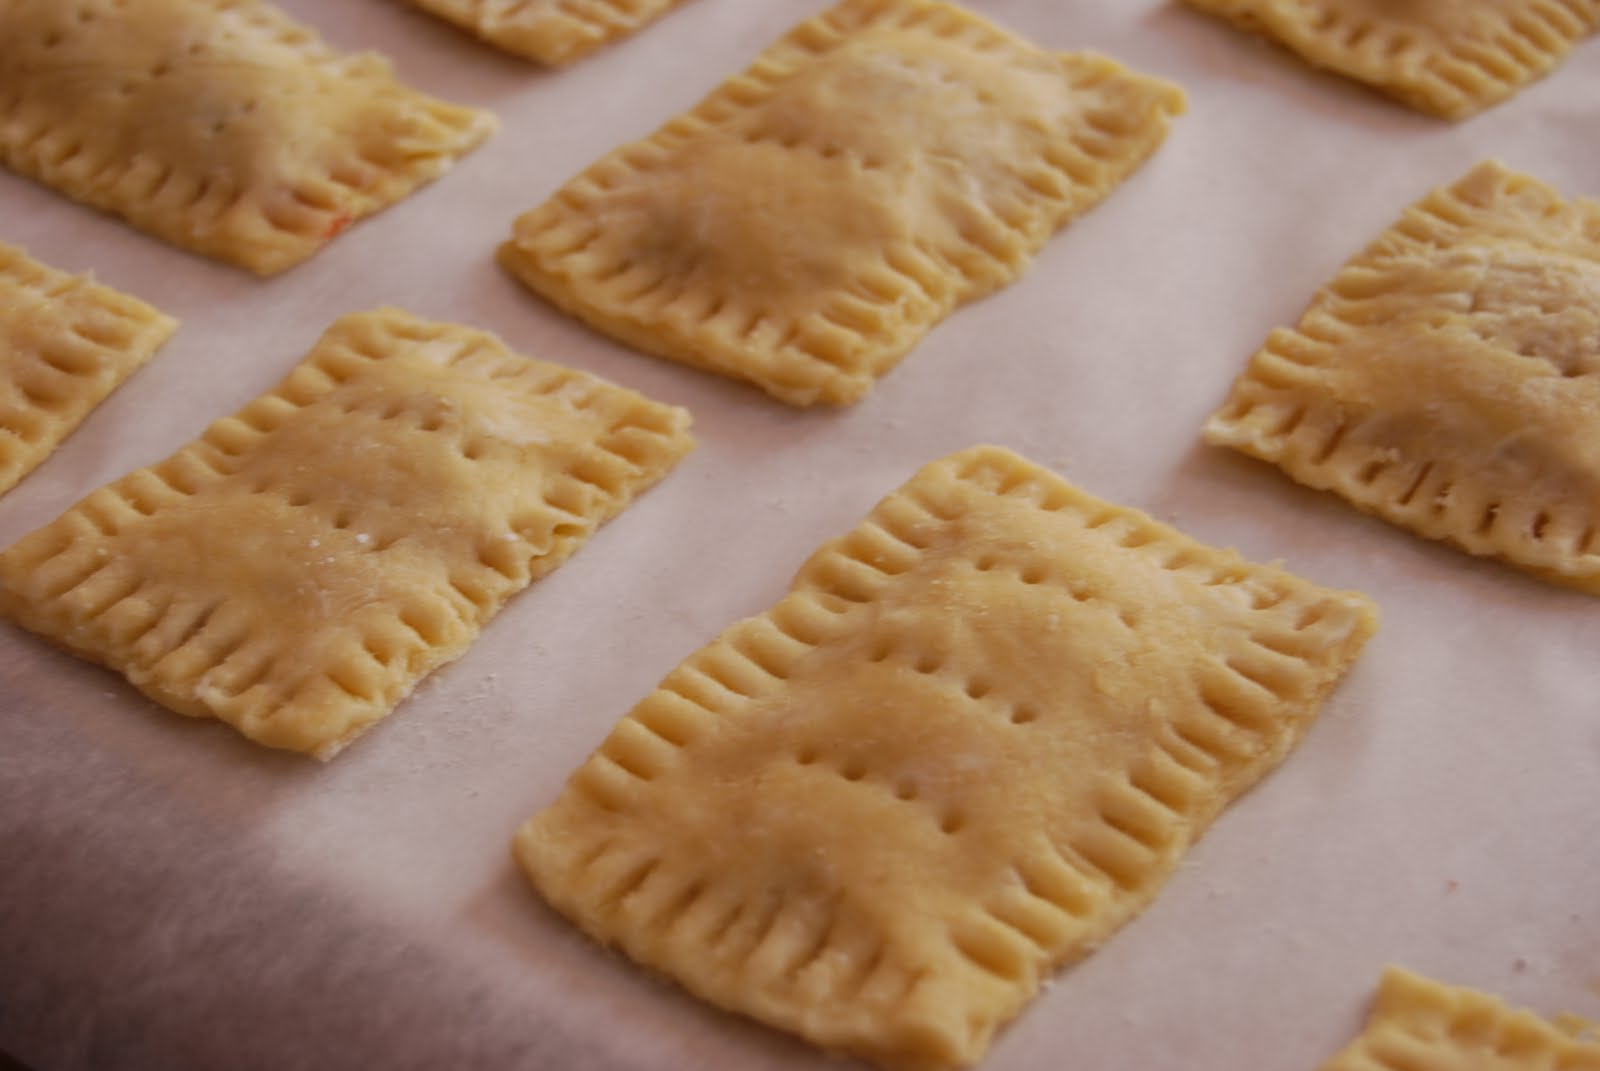 Homemade Pop-Tarts - Macaroni and Cheesecake